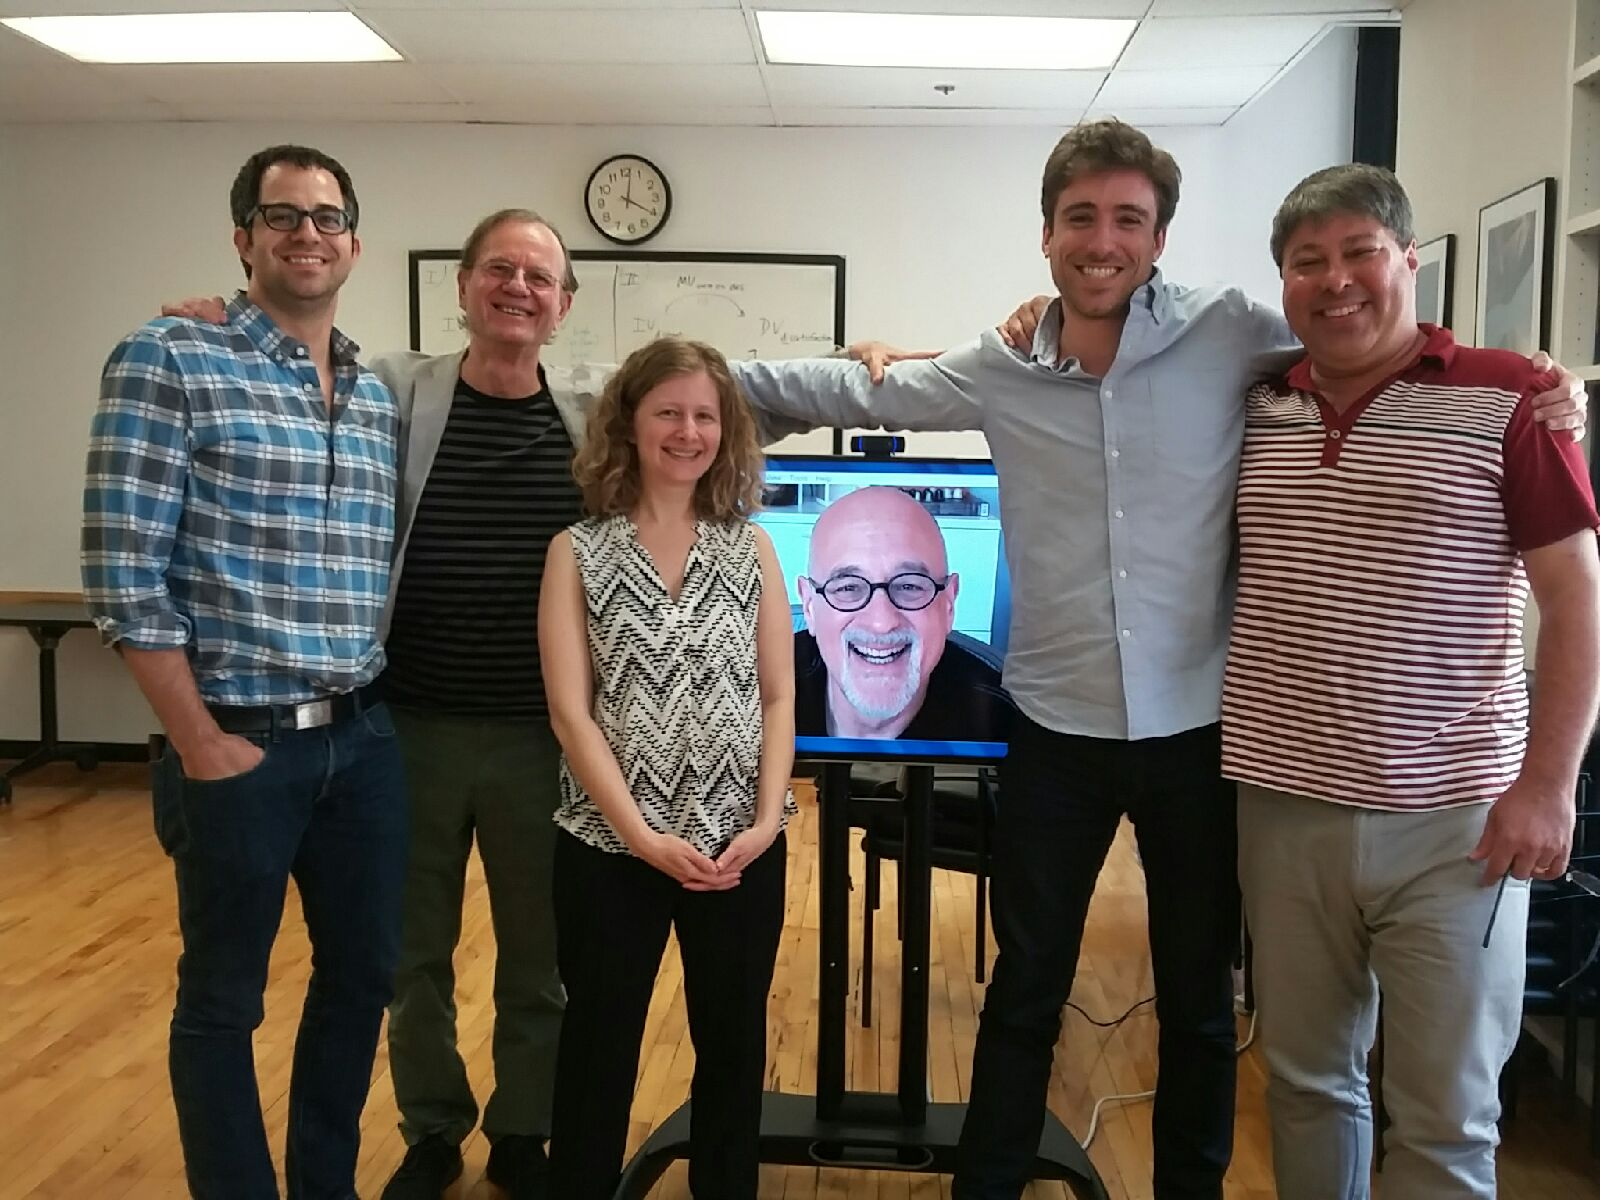 My dissertation committee: (from left) Jay Van Bavel, Yaacov Trope, Marjorie Rhodes, Dan Gilbert, John T. Jost